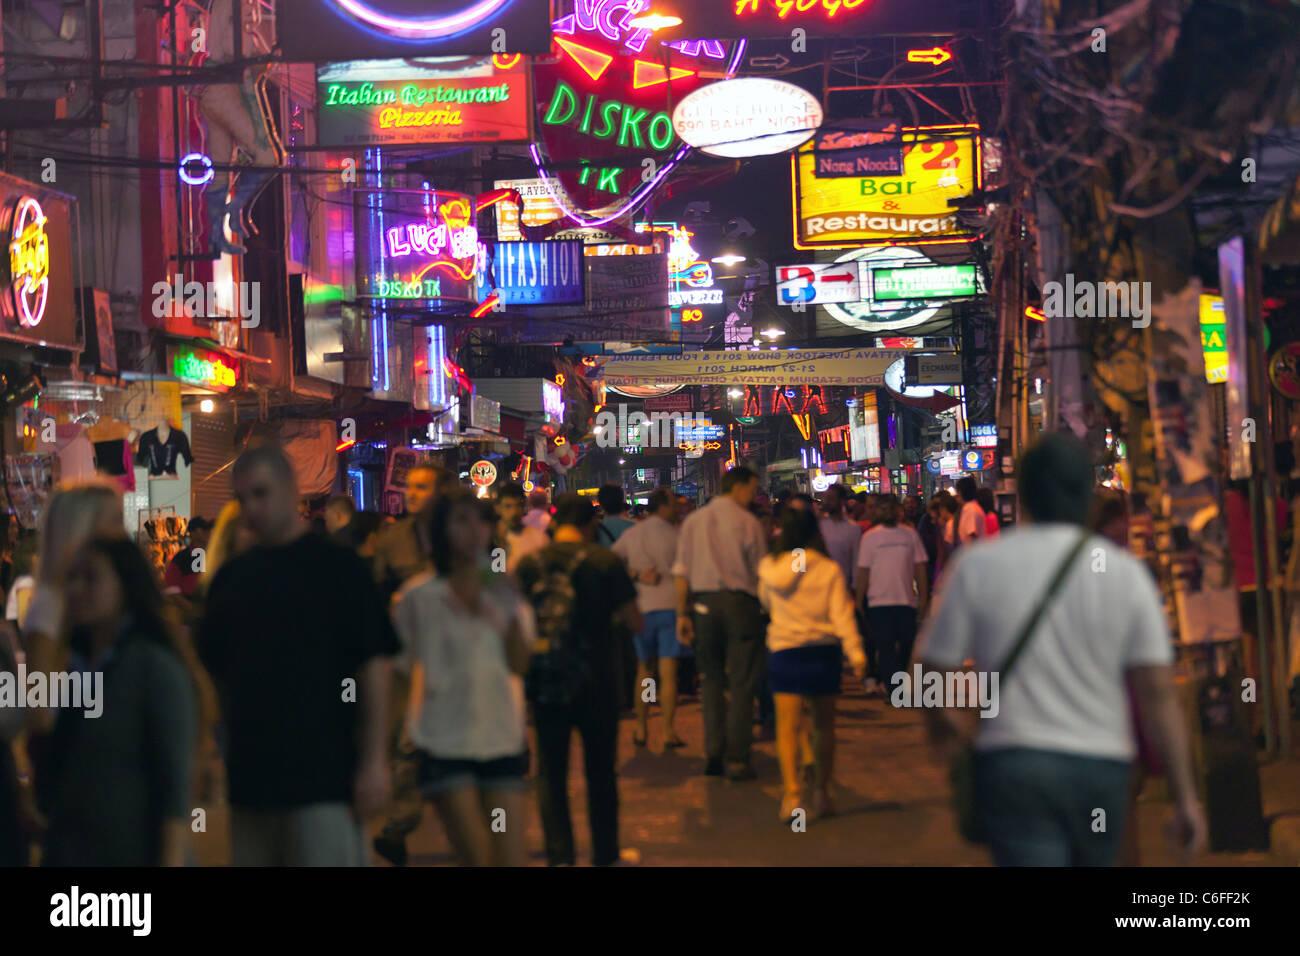 pattaya city walking street at night, many neon signs